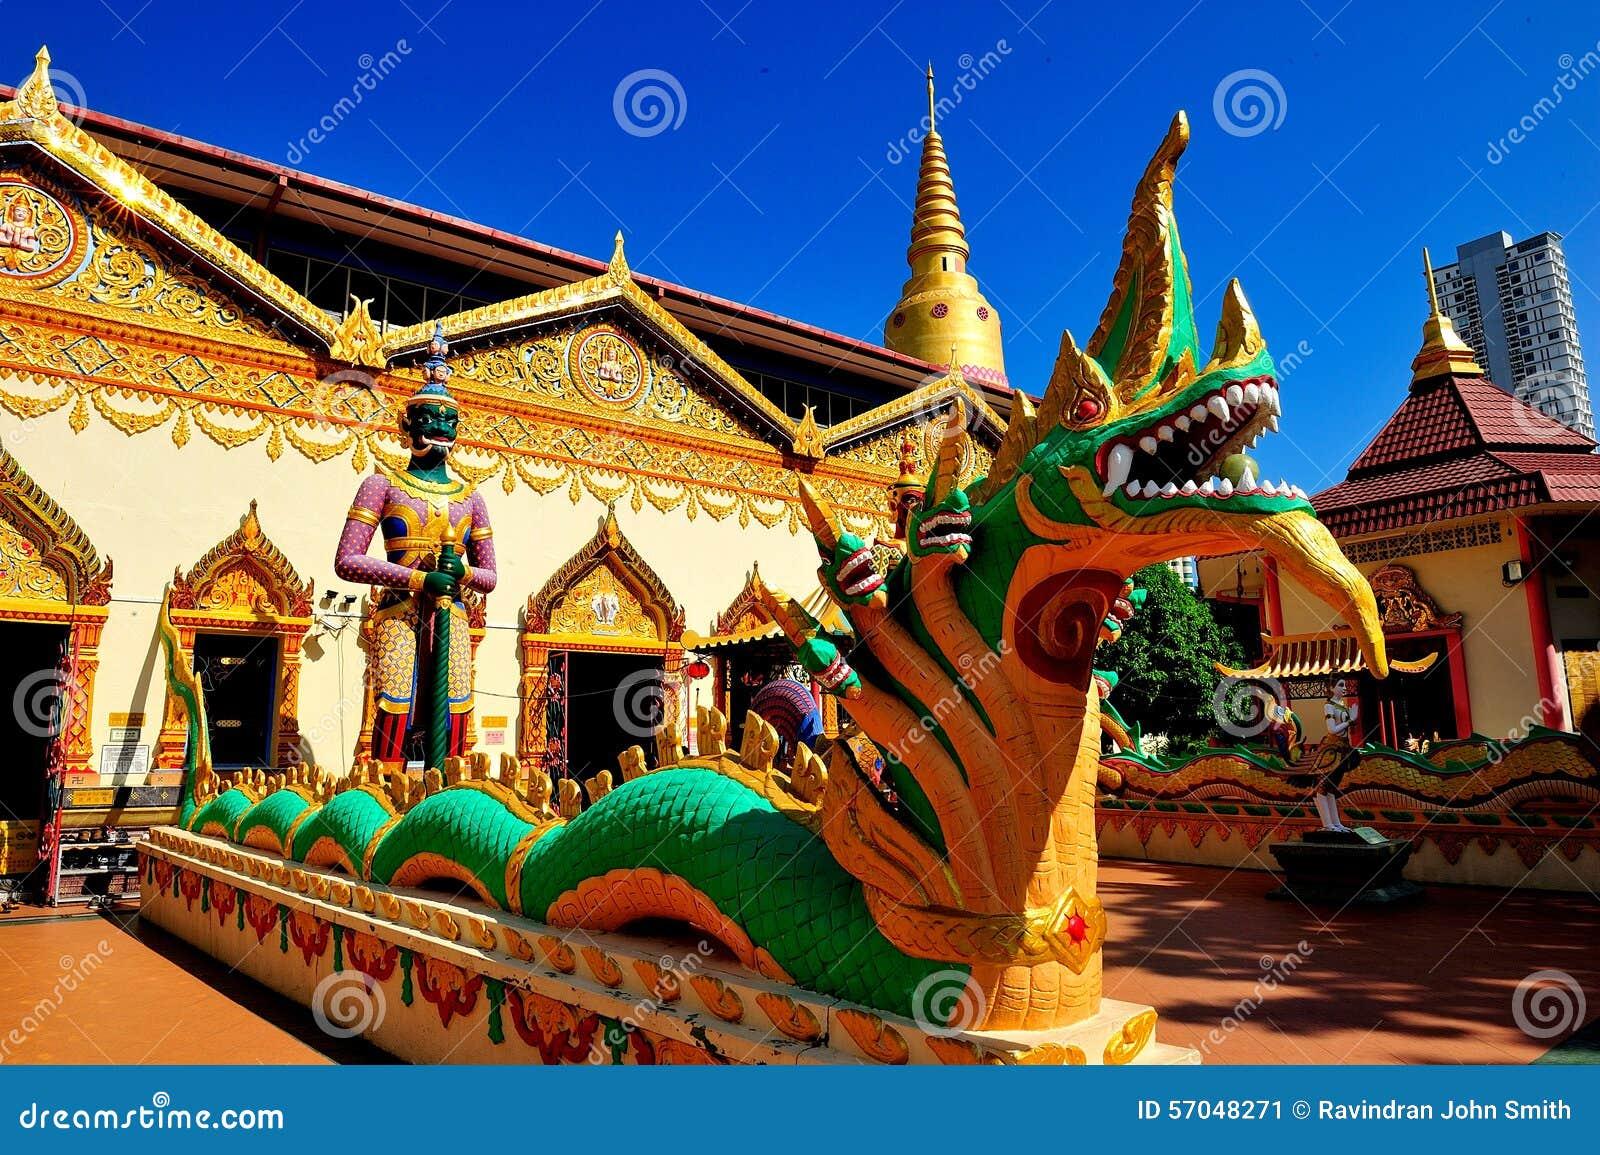 george town buddhist personals Retreats in tennessee (tn) on findthedivine  sacred geometry ,senior , silence, singles,spa,spiritual  anglican,baha'i,baptist,benedictine,buddhist.